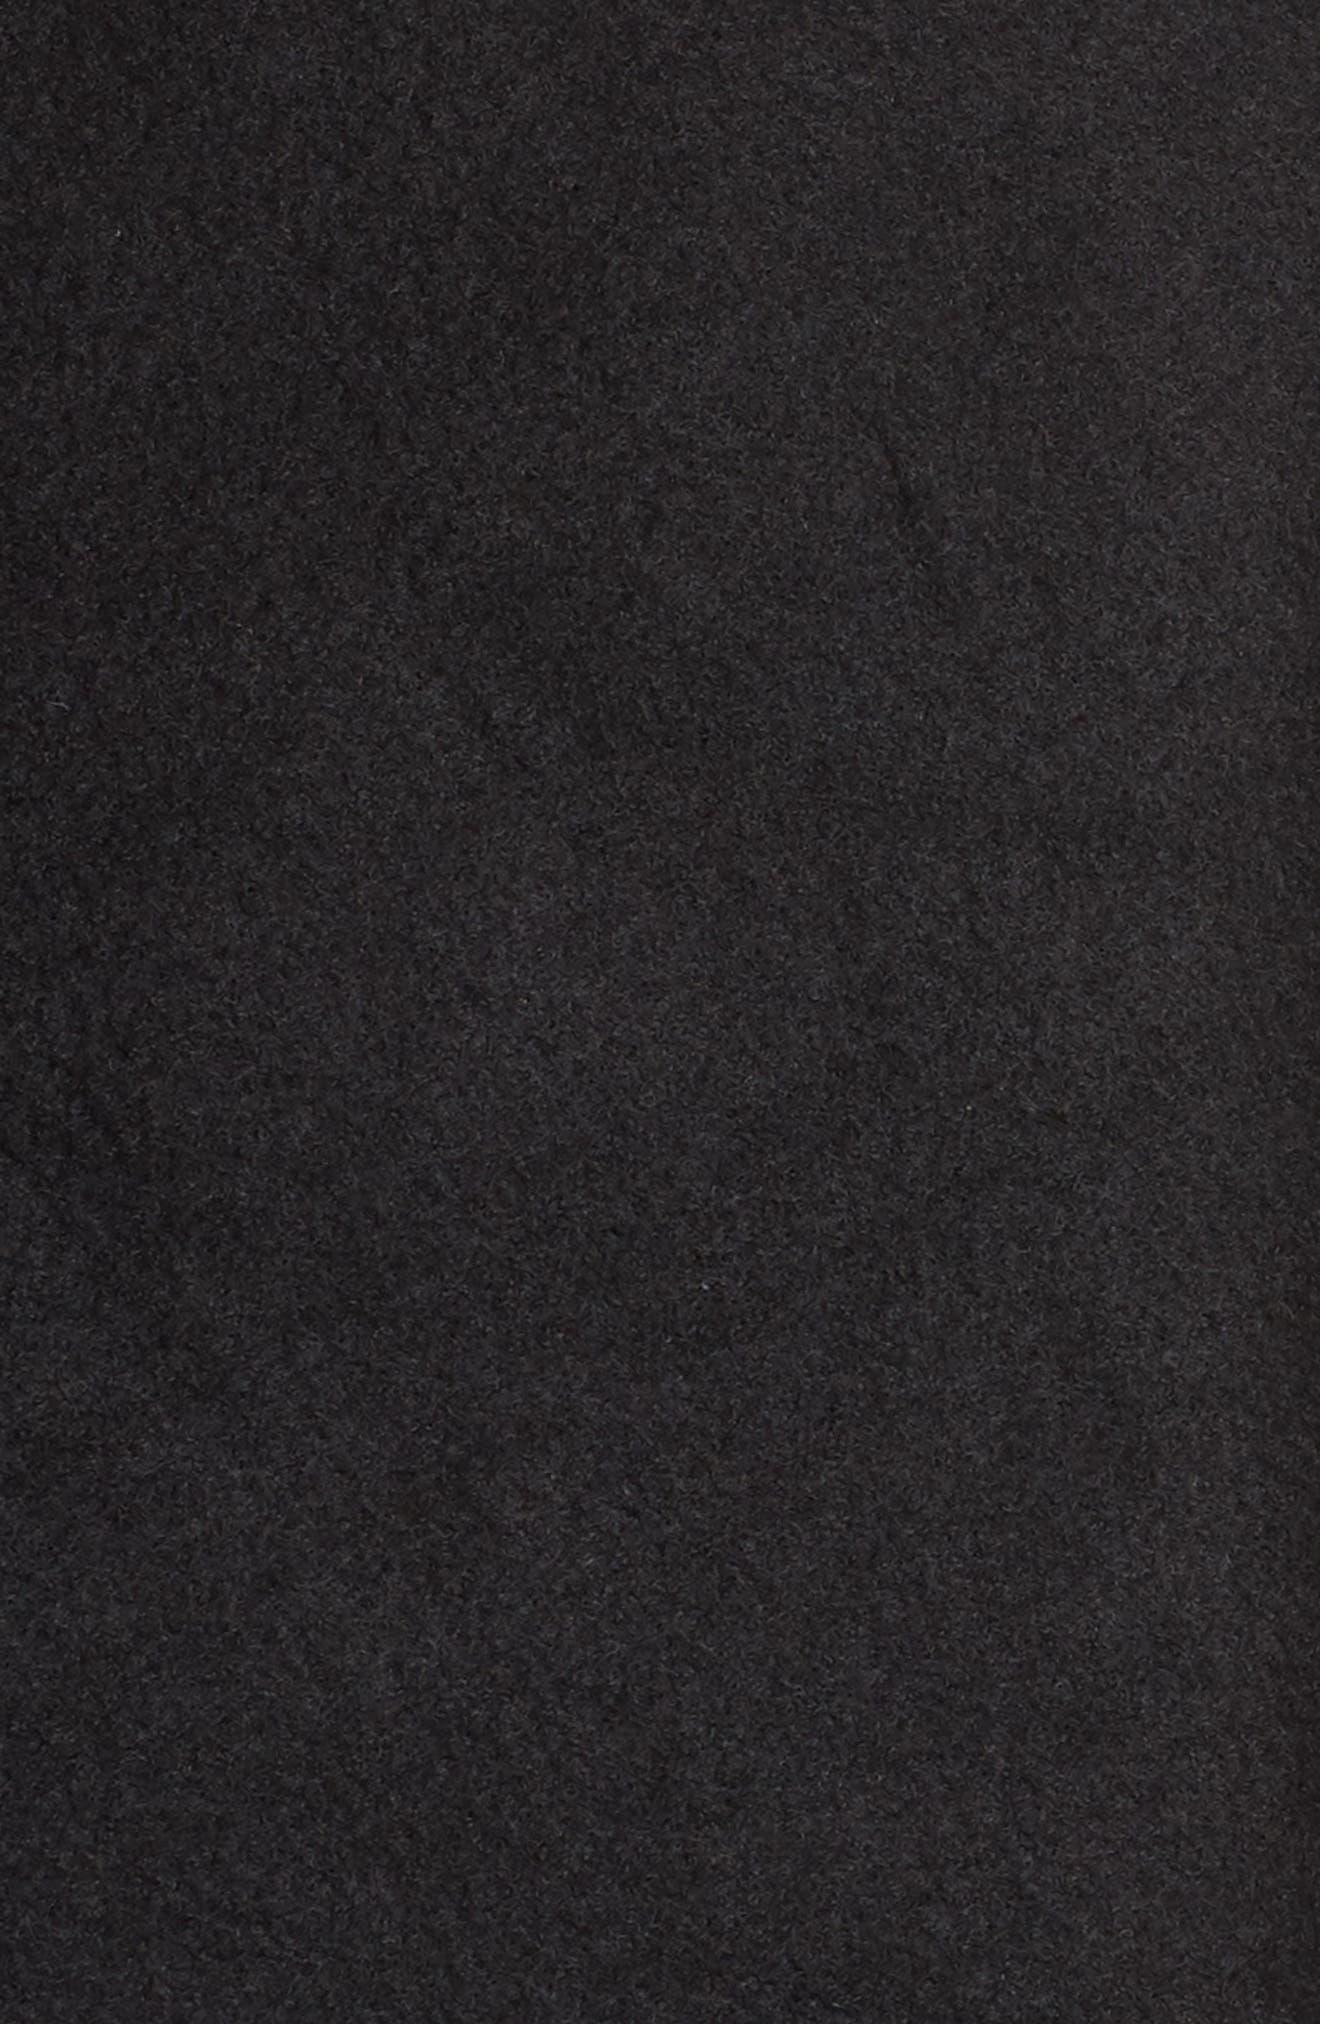 UGG<SUP>®</SUP>, Janni Fleece Cardigan, Alternate thumbnail 5, color, BLACK